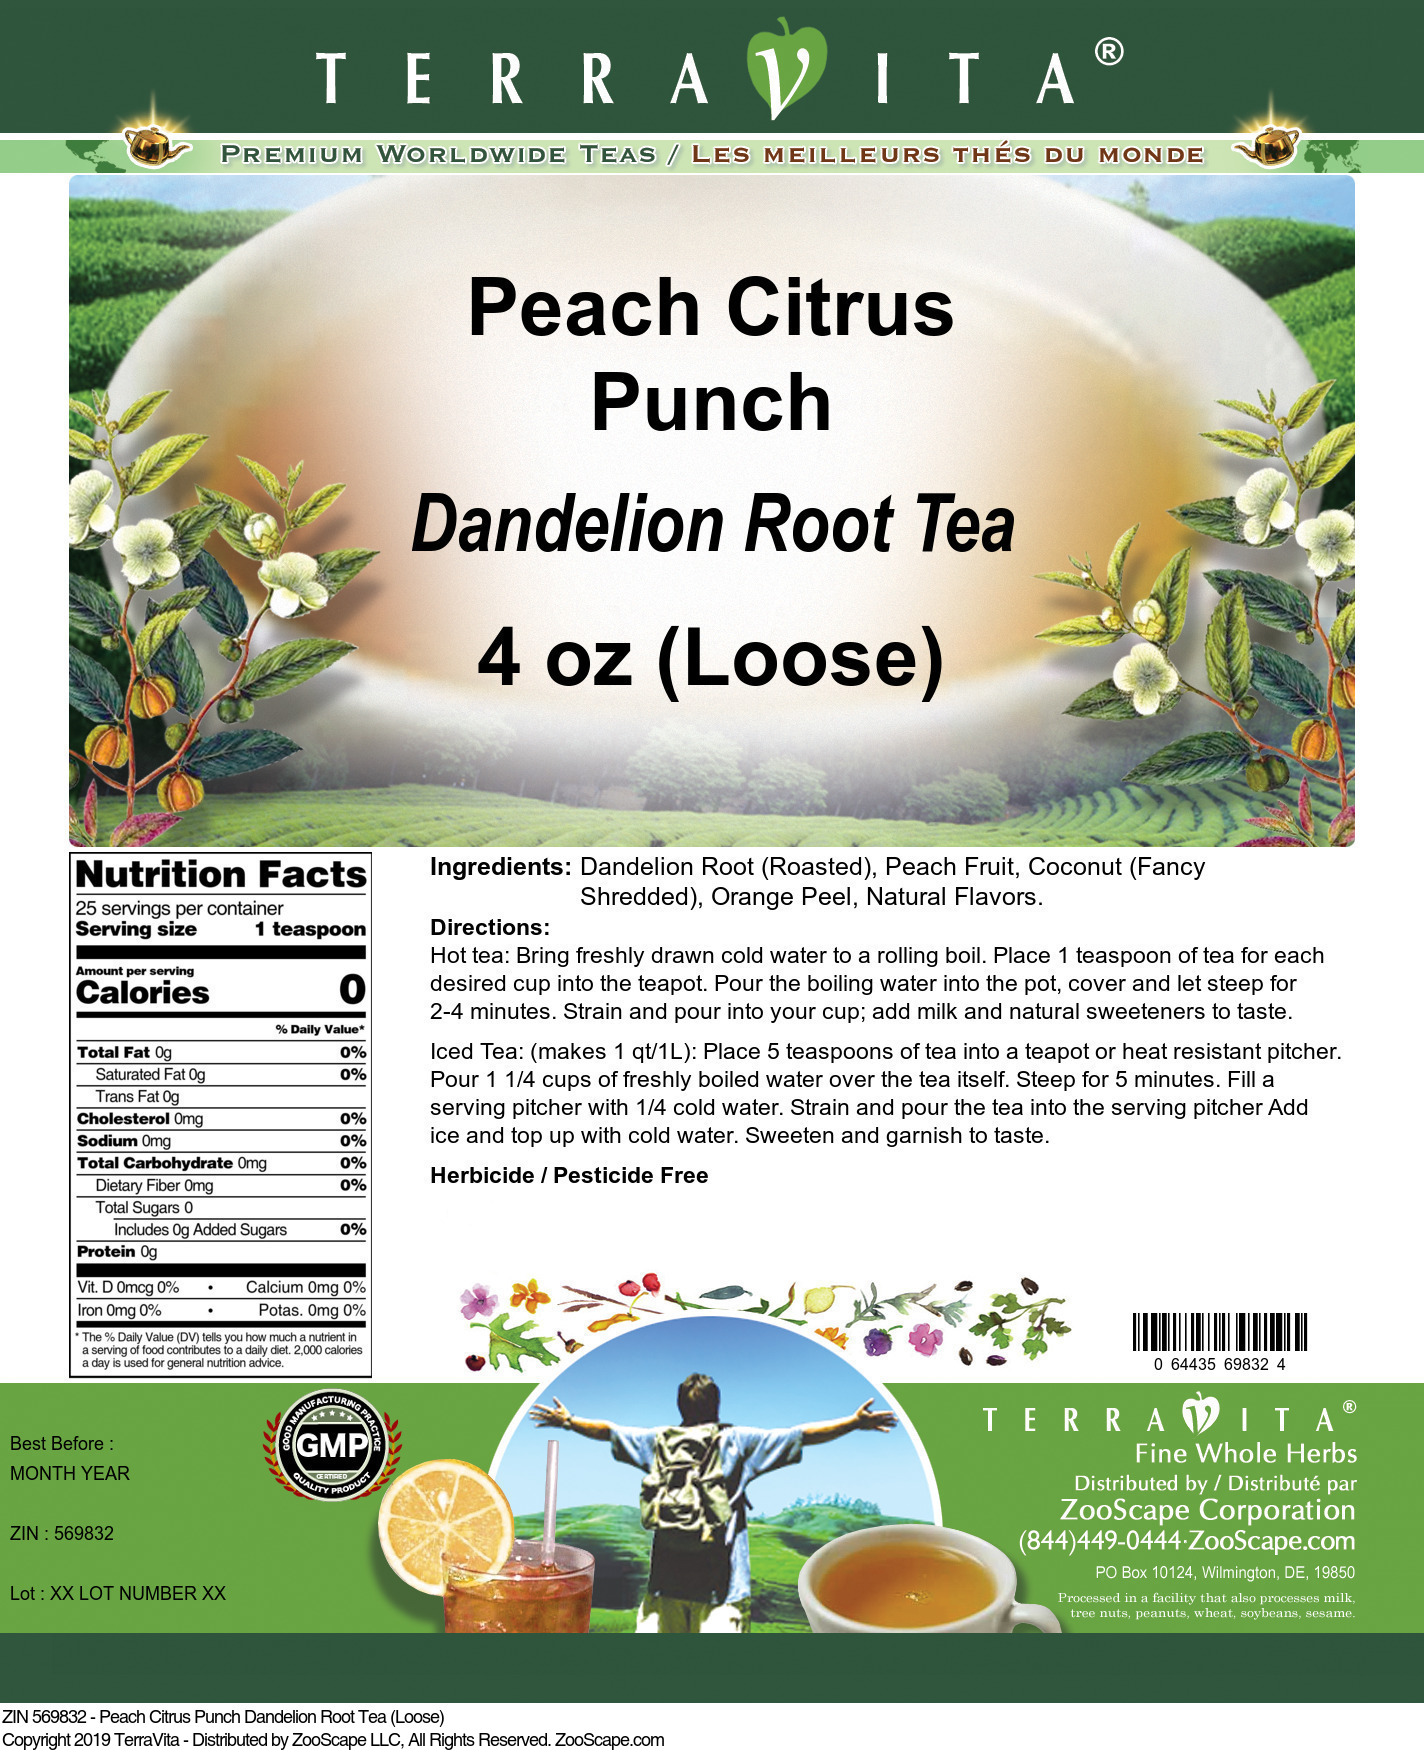 Peach Citrus Punch Dandelion Root Tea (Loose)